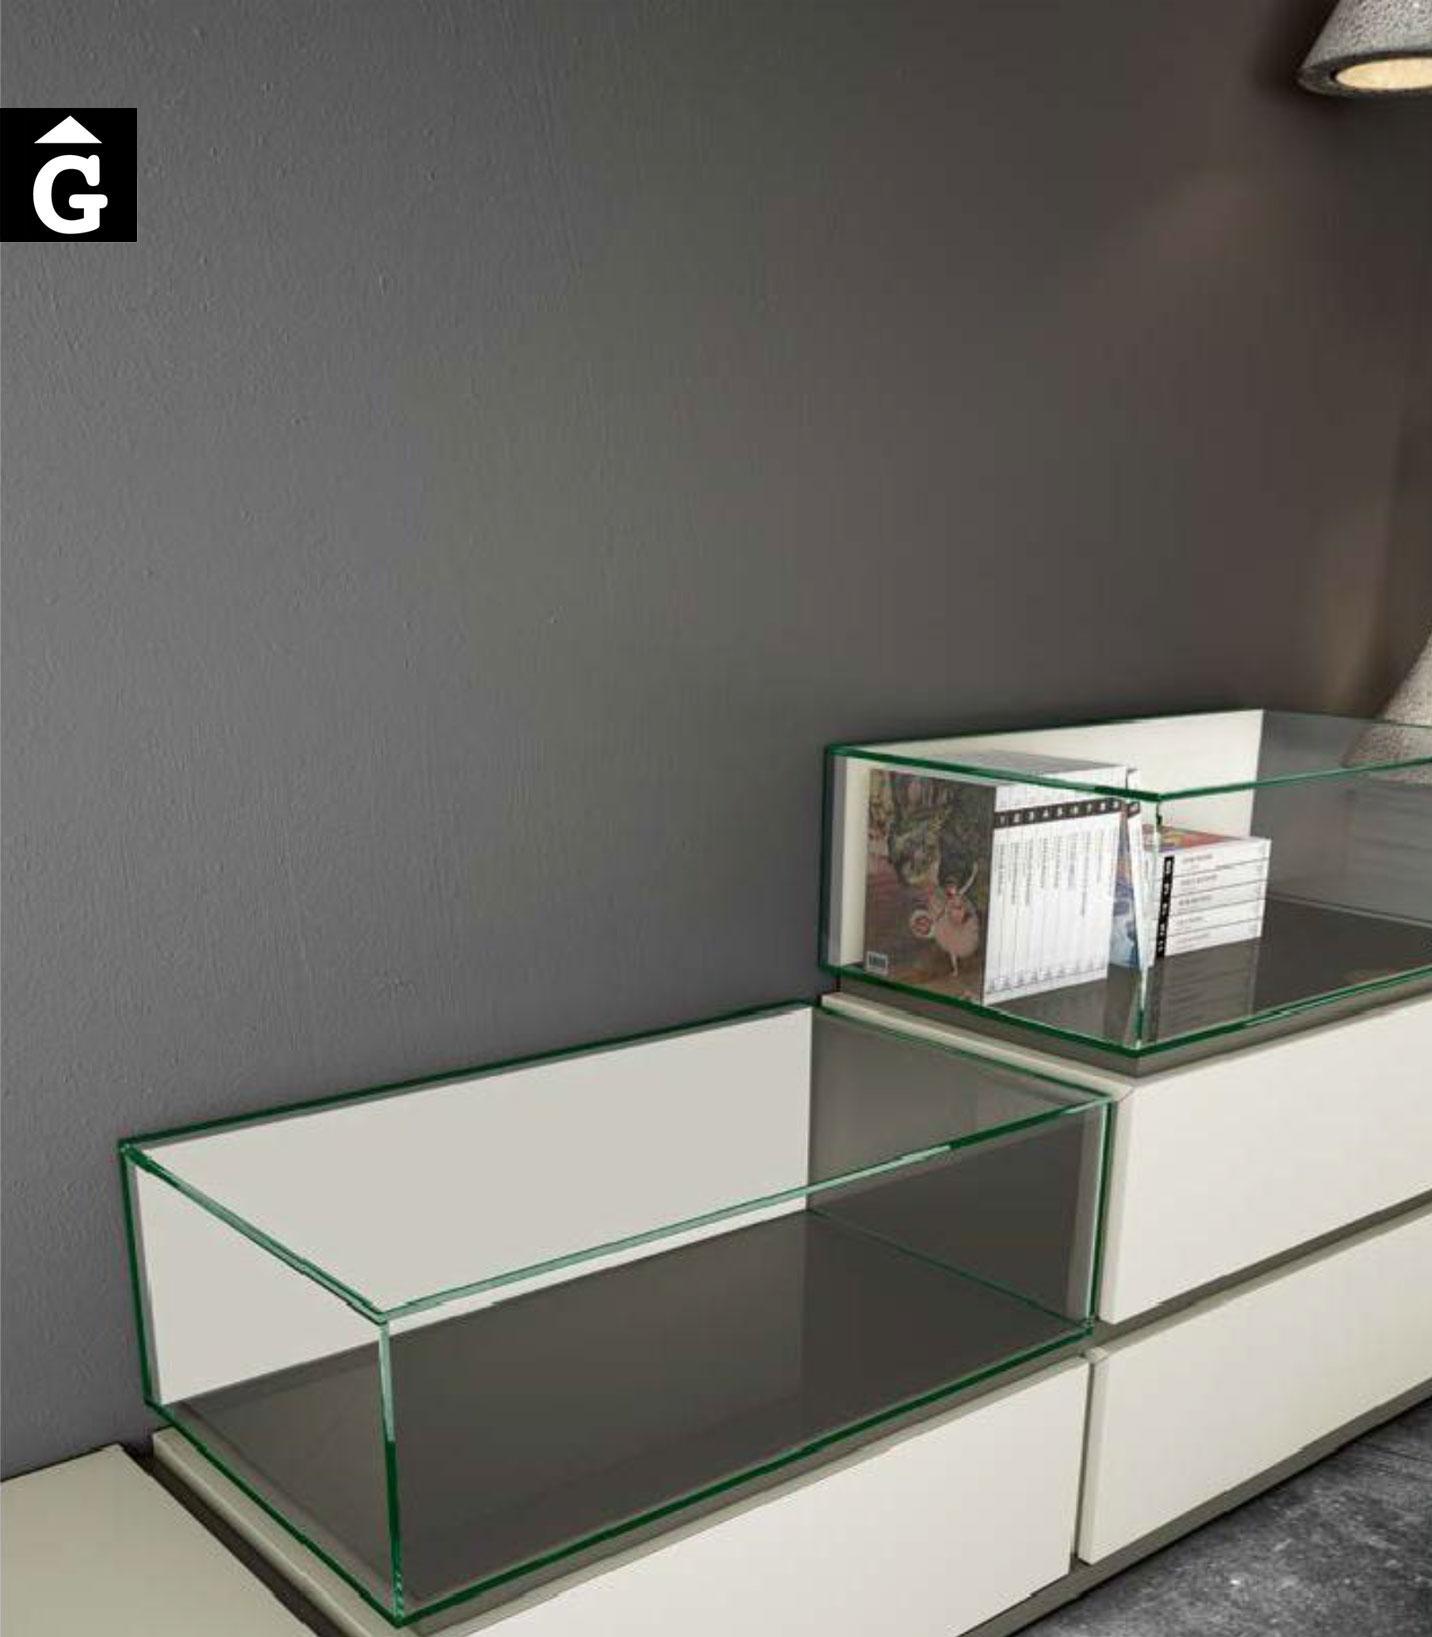 MOBLE-58-V-CONNECTOR-EMEDE-mobles-by-Mobles-GIFREU-Girona-ESPAI-EMEDE-Epacio-emede-Muebles-MD-moble-menjador-Sala-estar-habitatge-qualitat-laca-xapa-natural